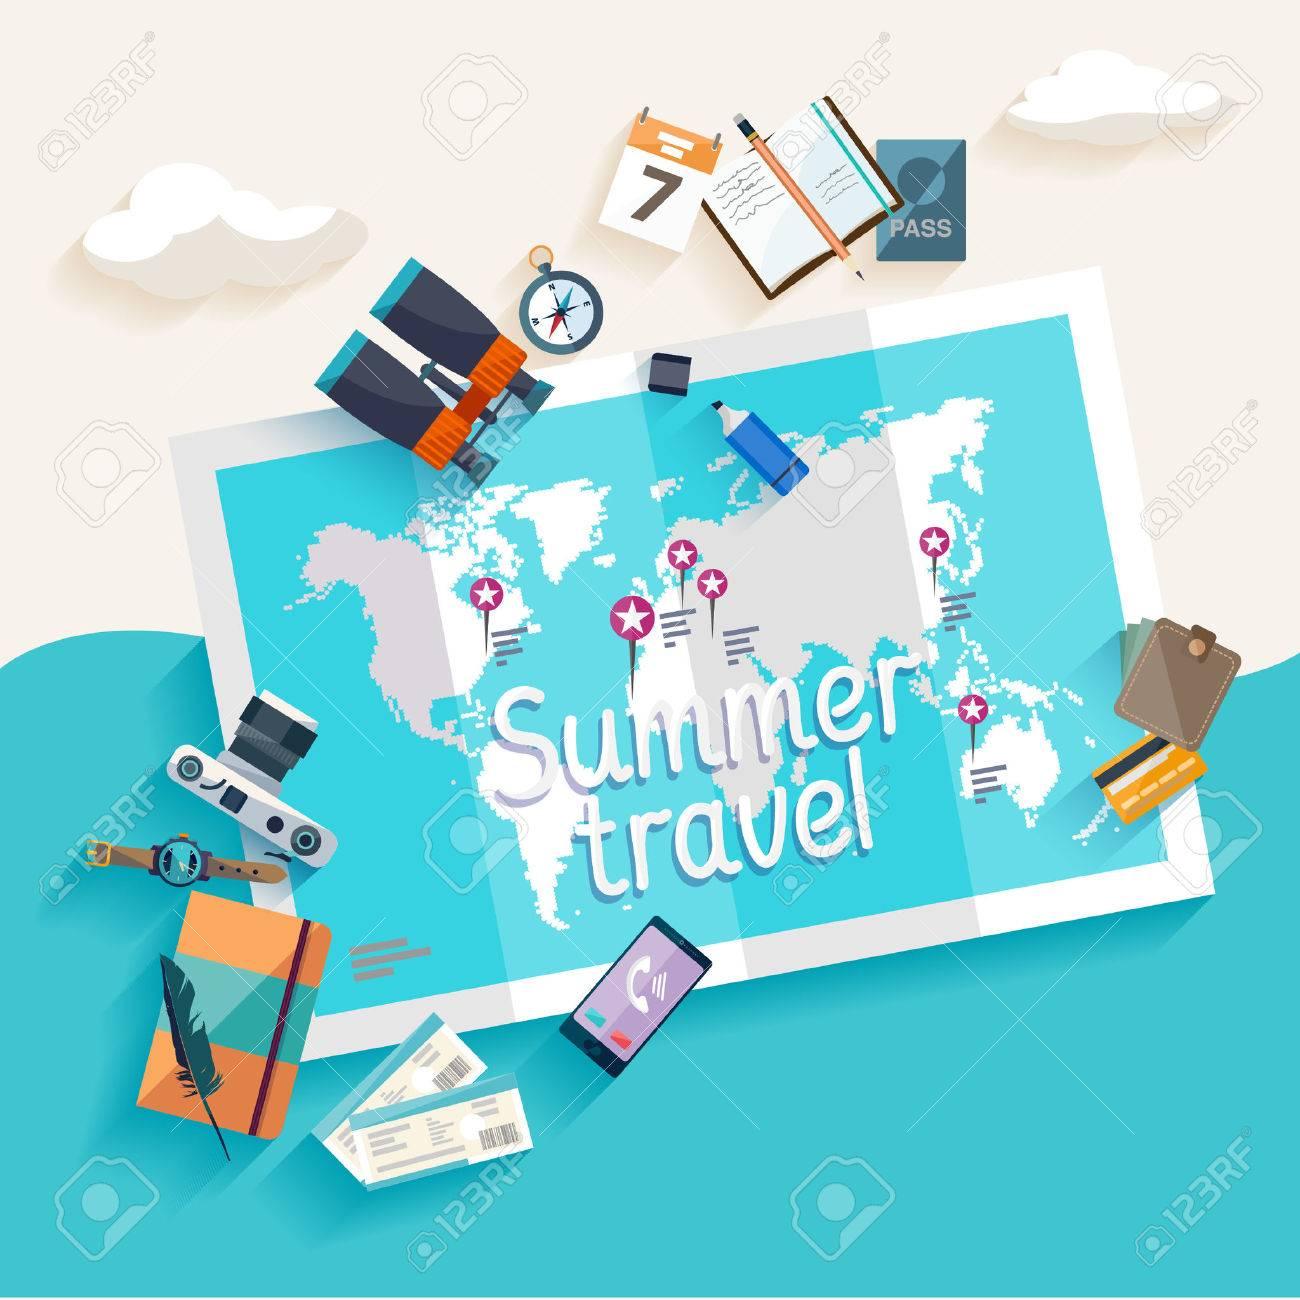 Summer travel. Flat design. Stock Vector - 44238154